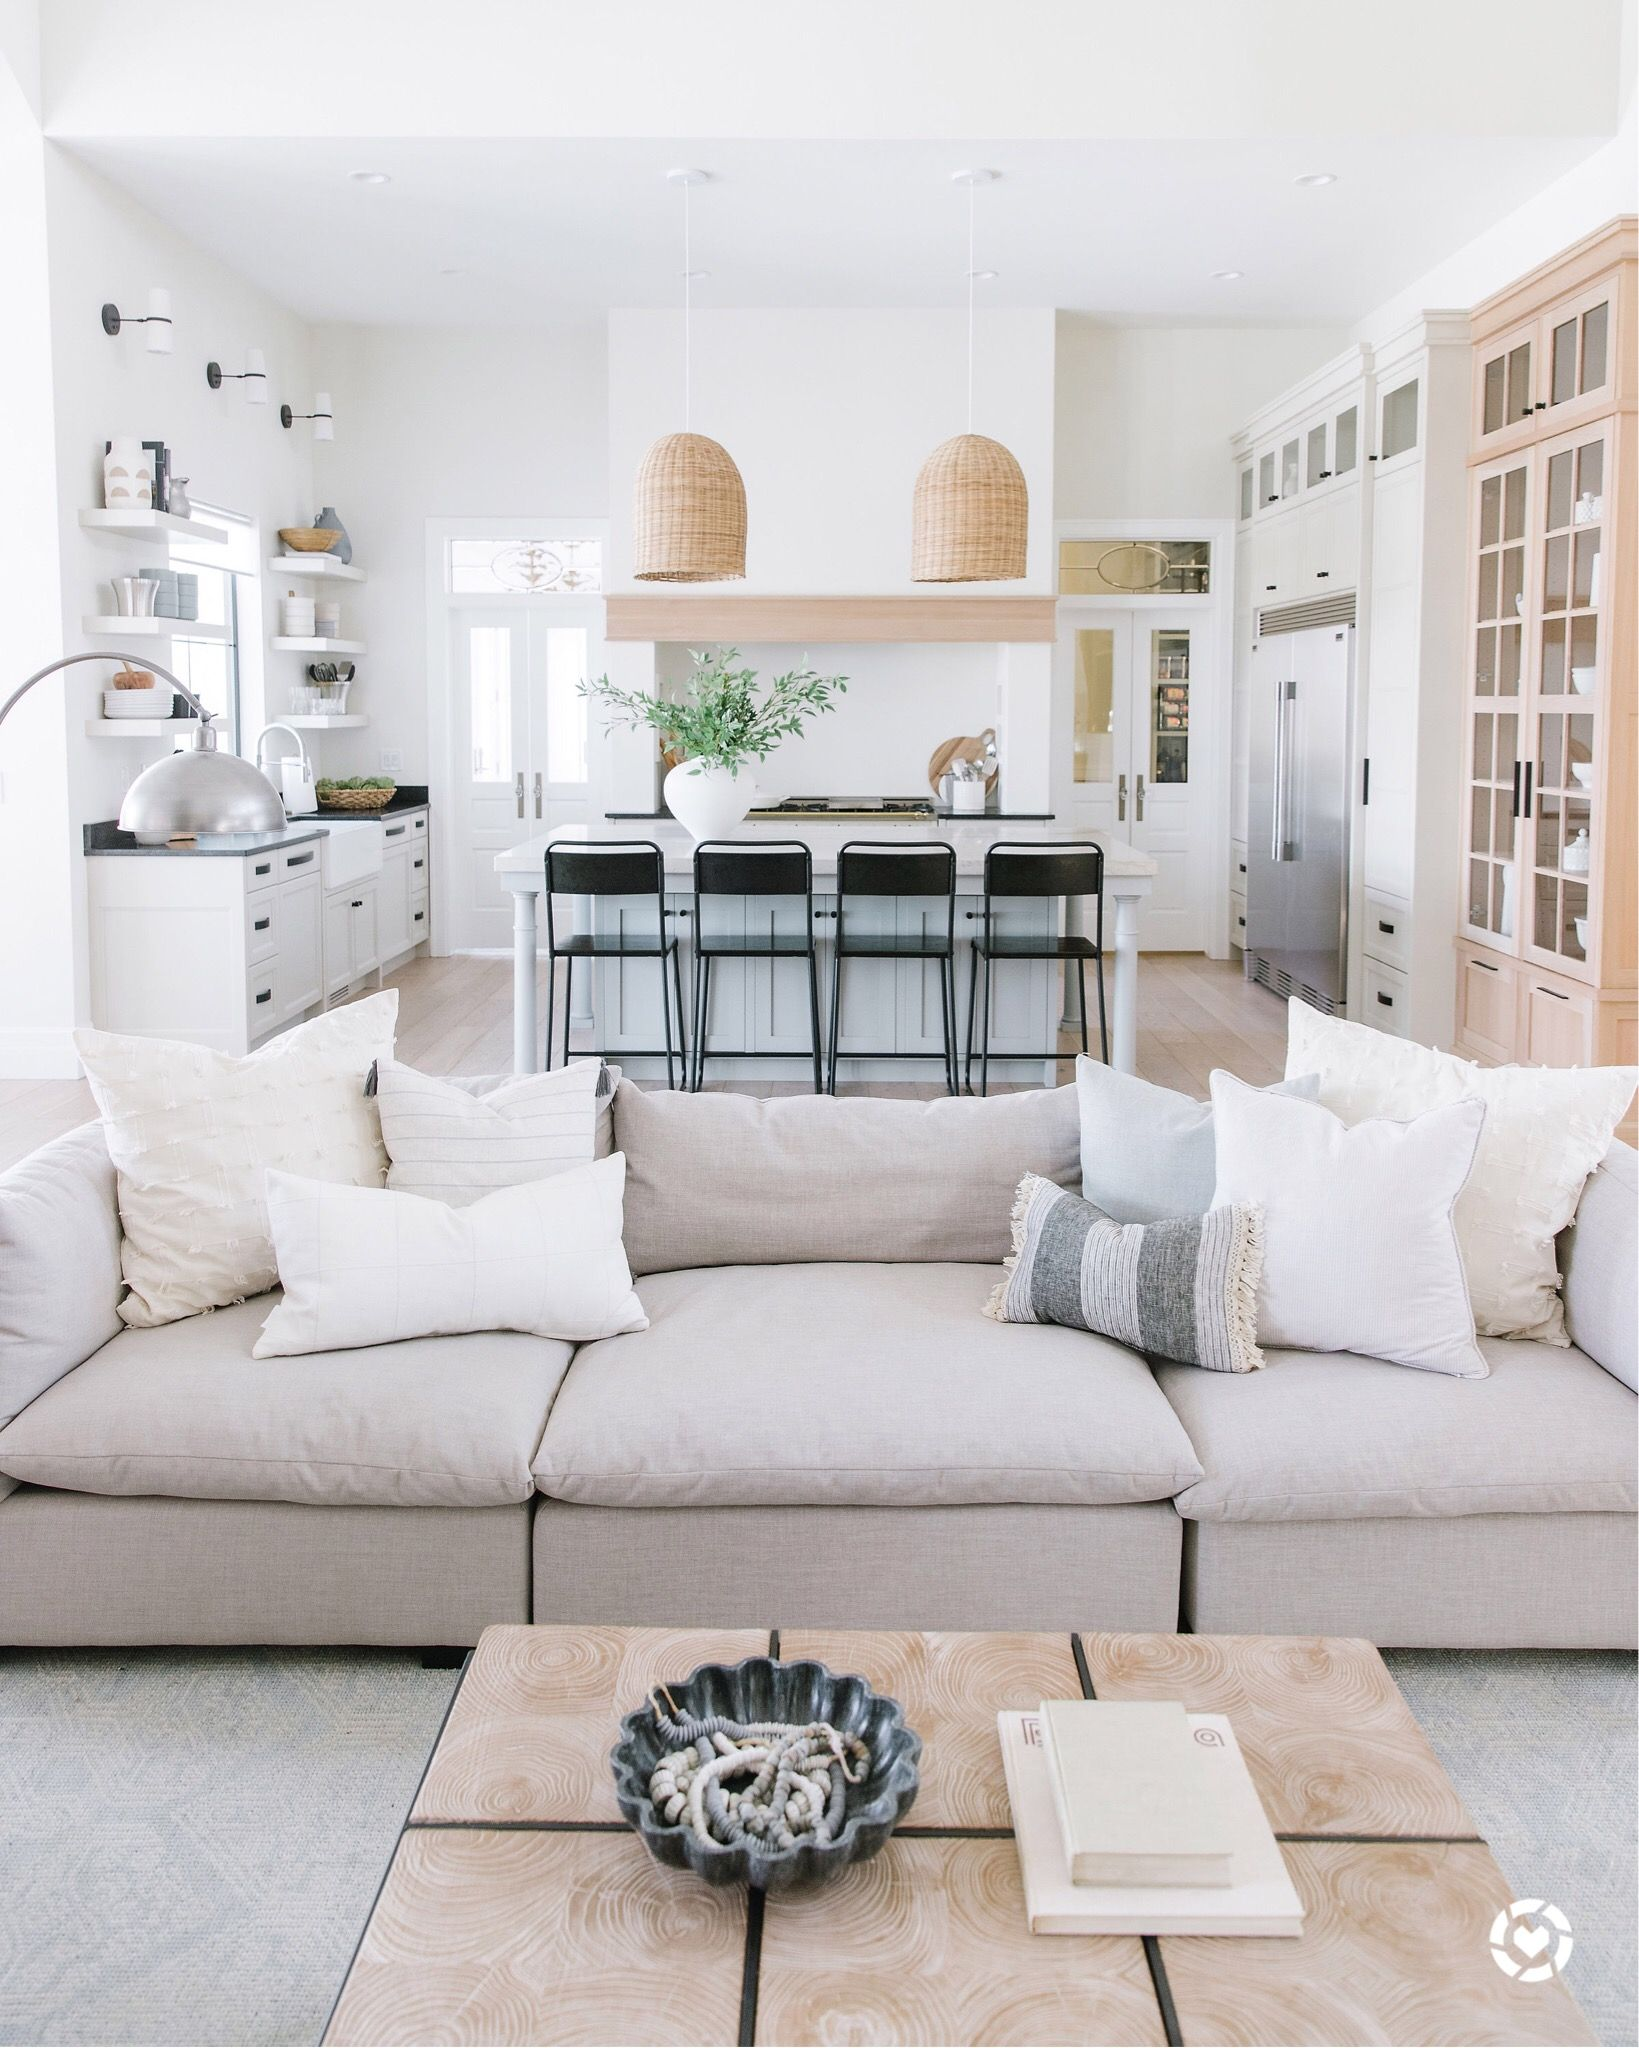 Decorating With Texture Minimalist Living Room Decor H